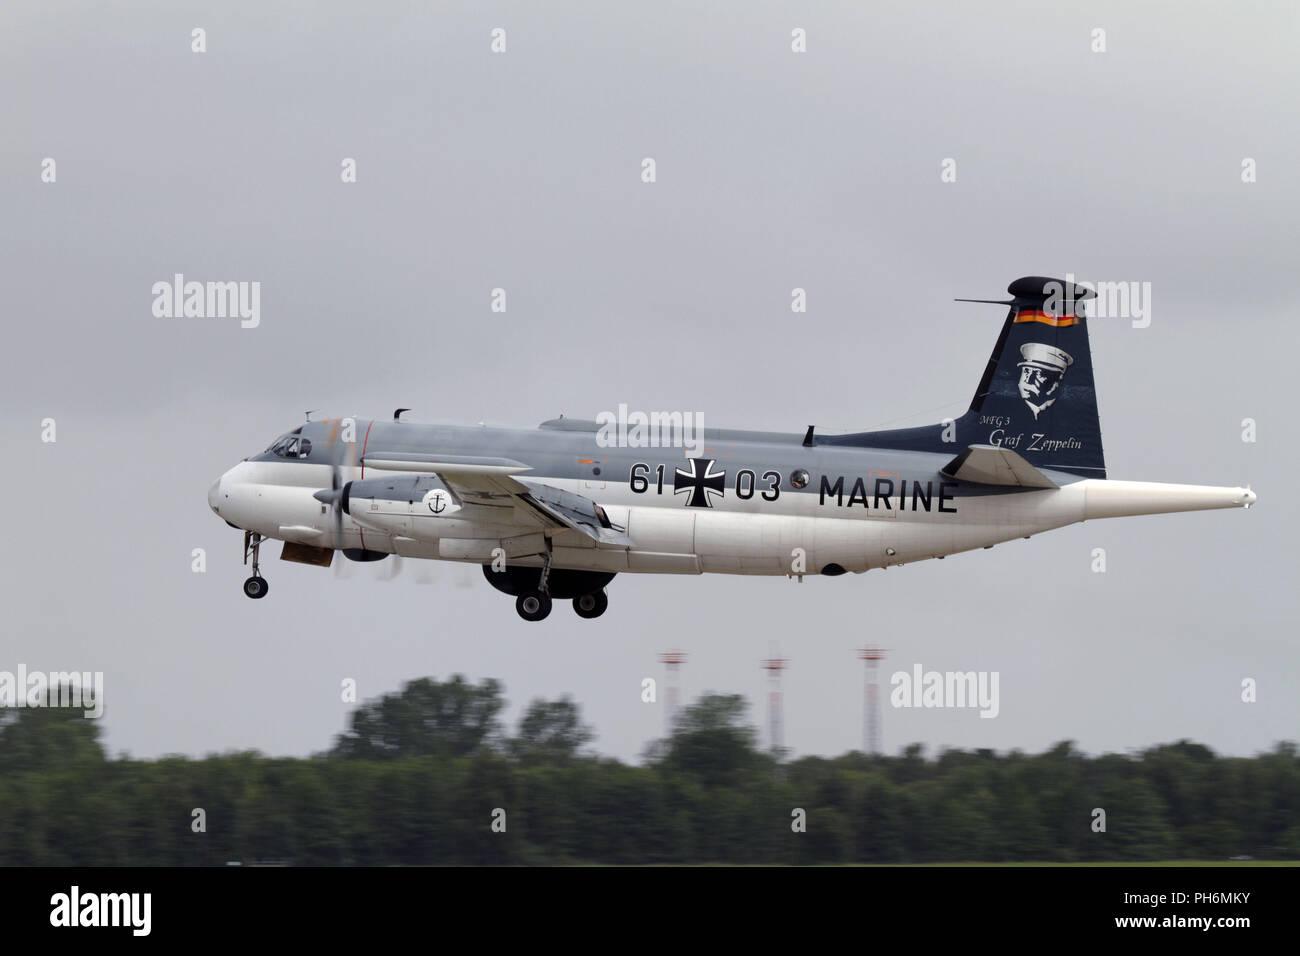 Marinefliegergeschwader 3 in Nordholz. Stock Photo